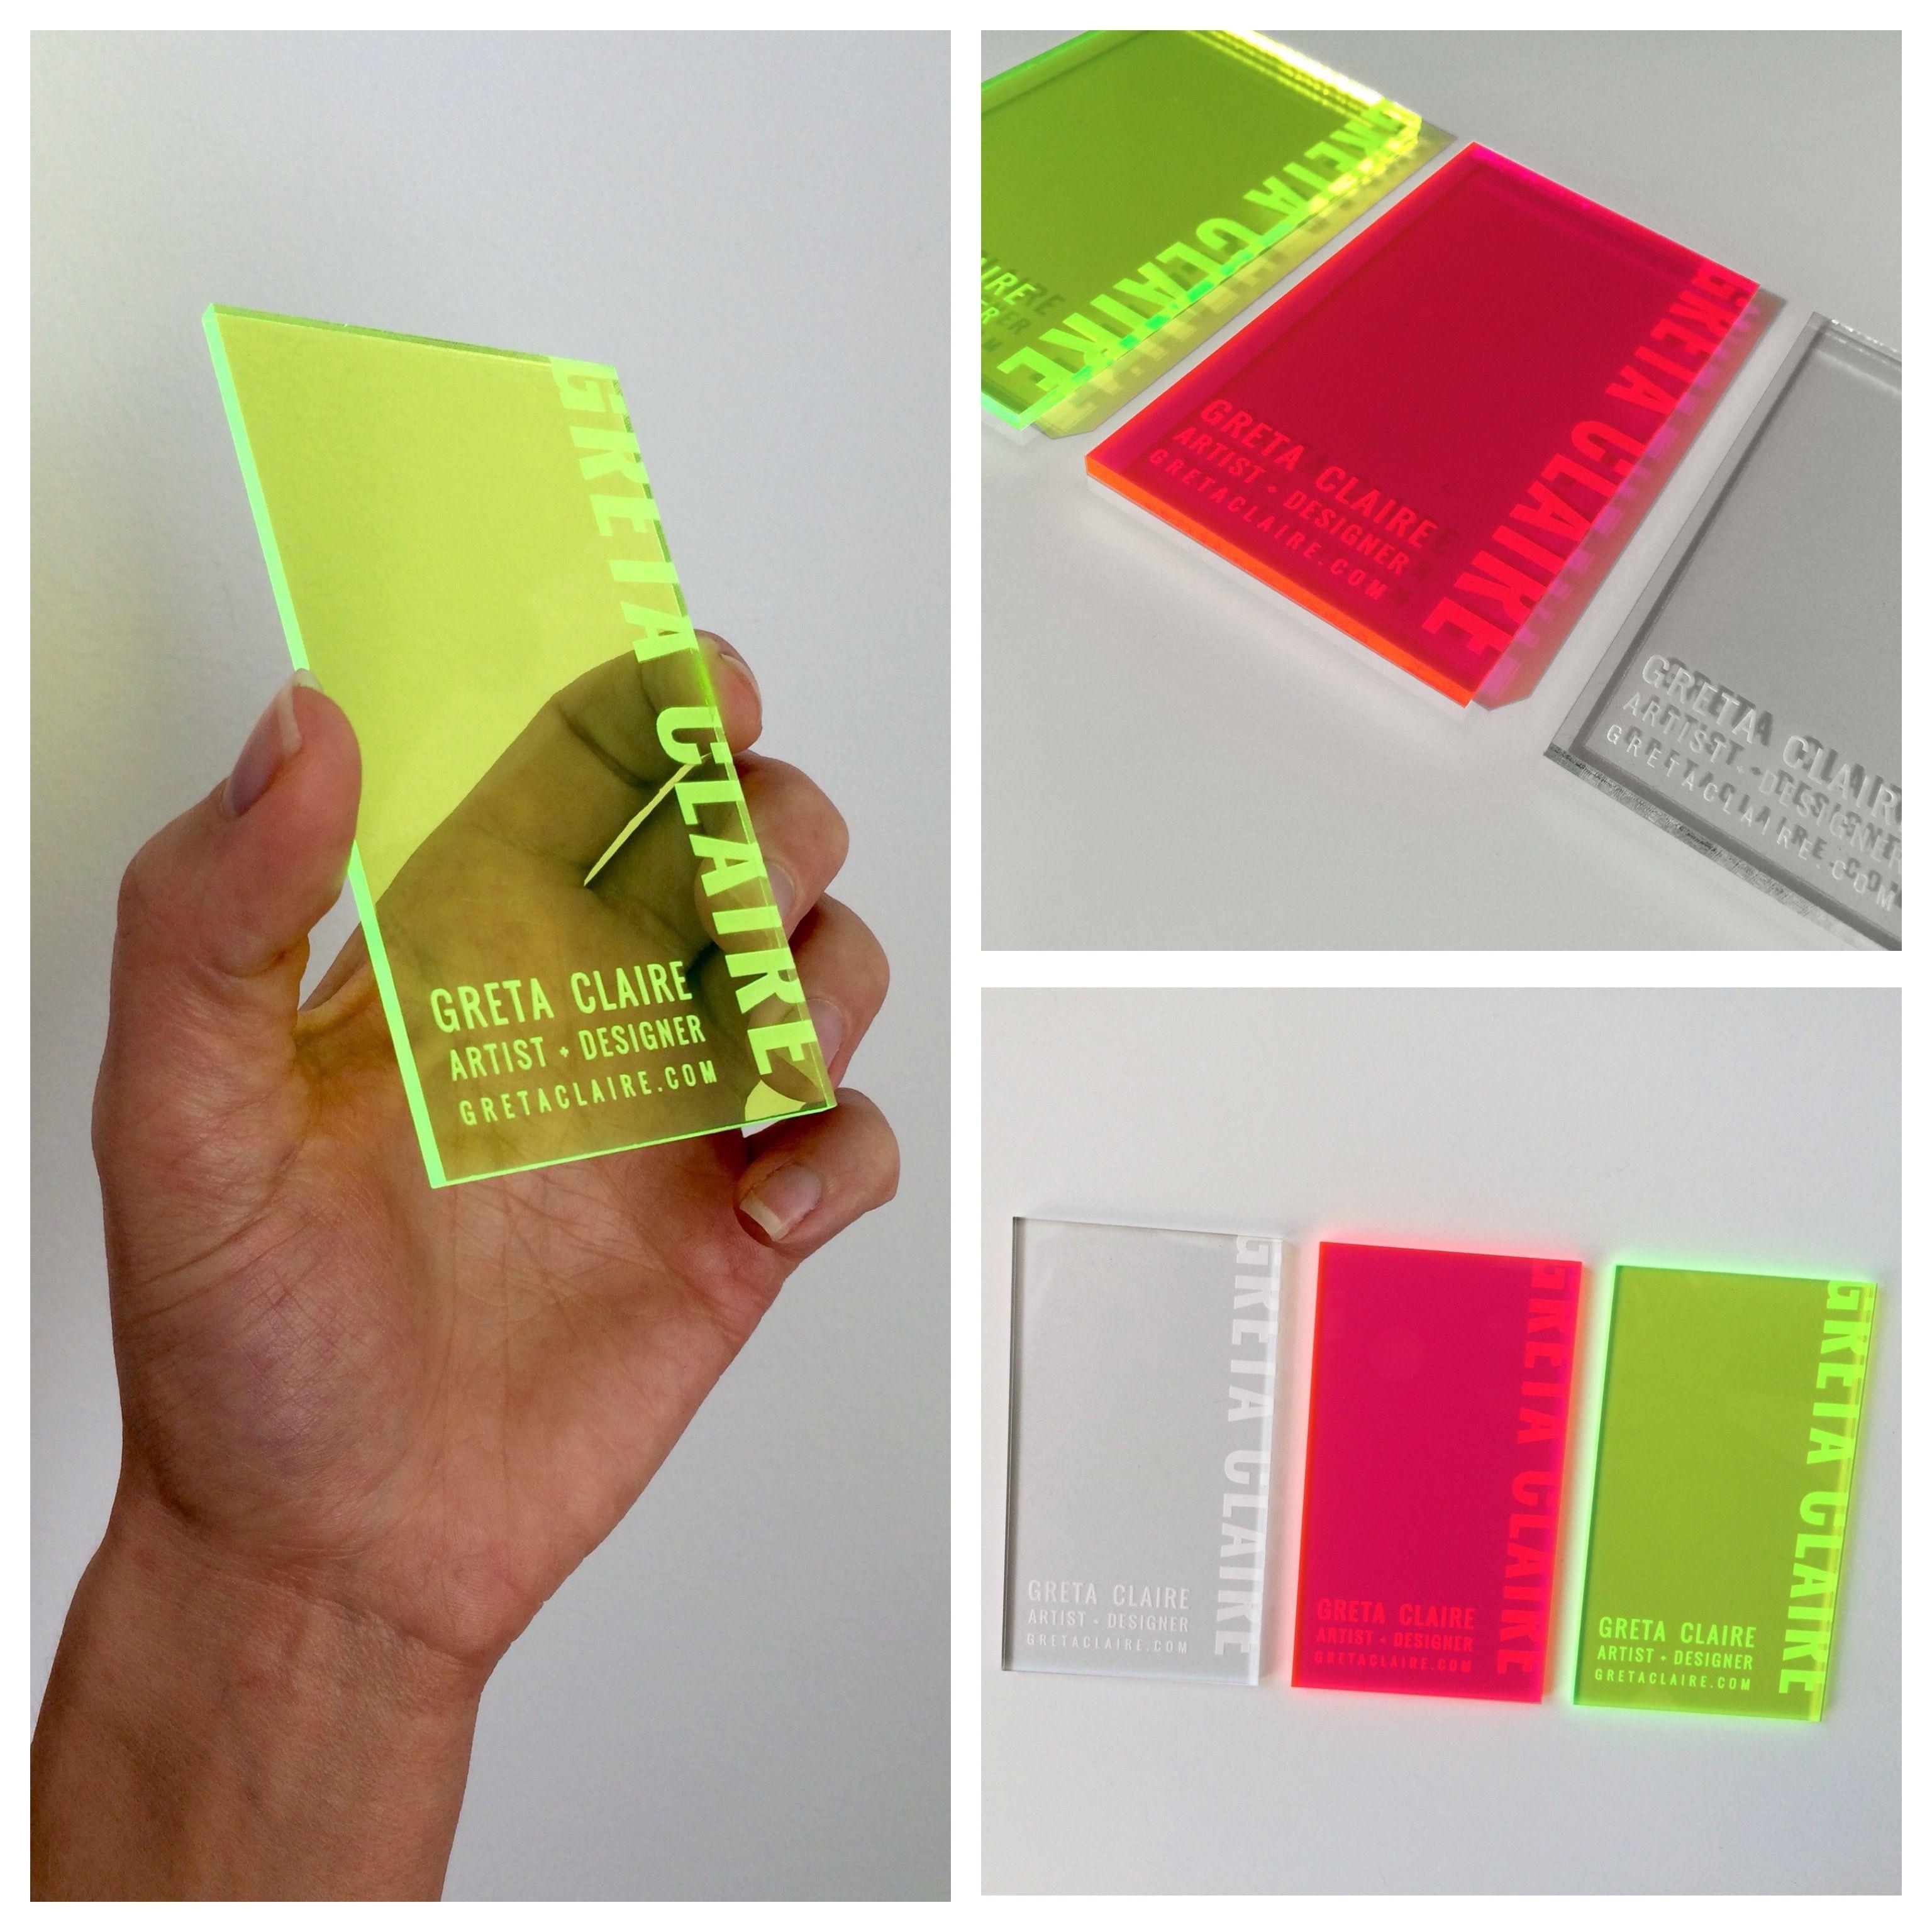 Artist Designer Greta Claire Acrylic Business Cards Business Cards Business Card Design Unique Business Cards